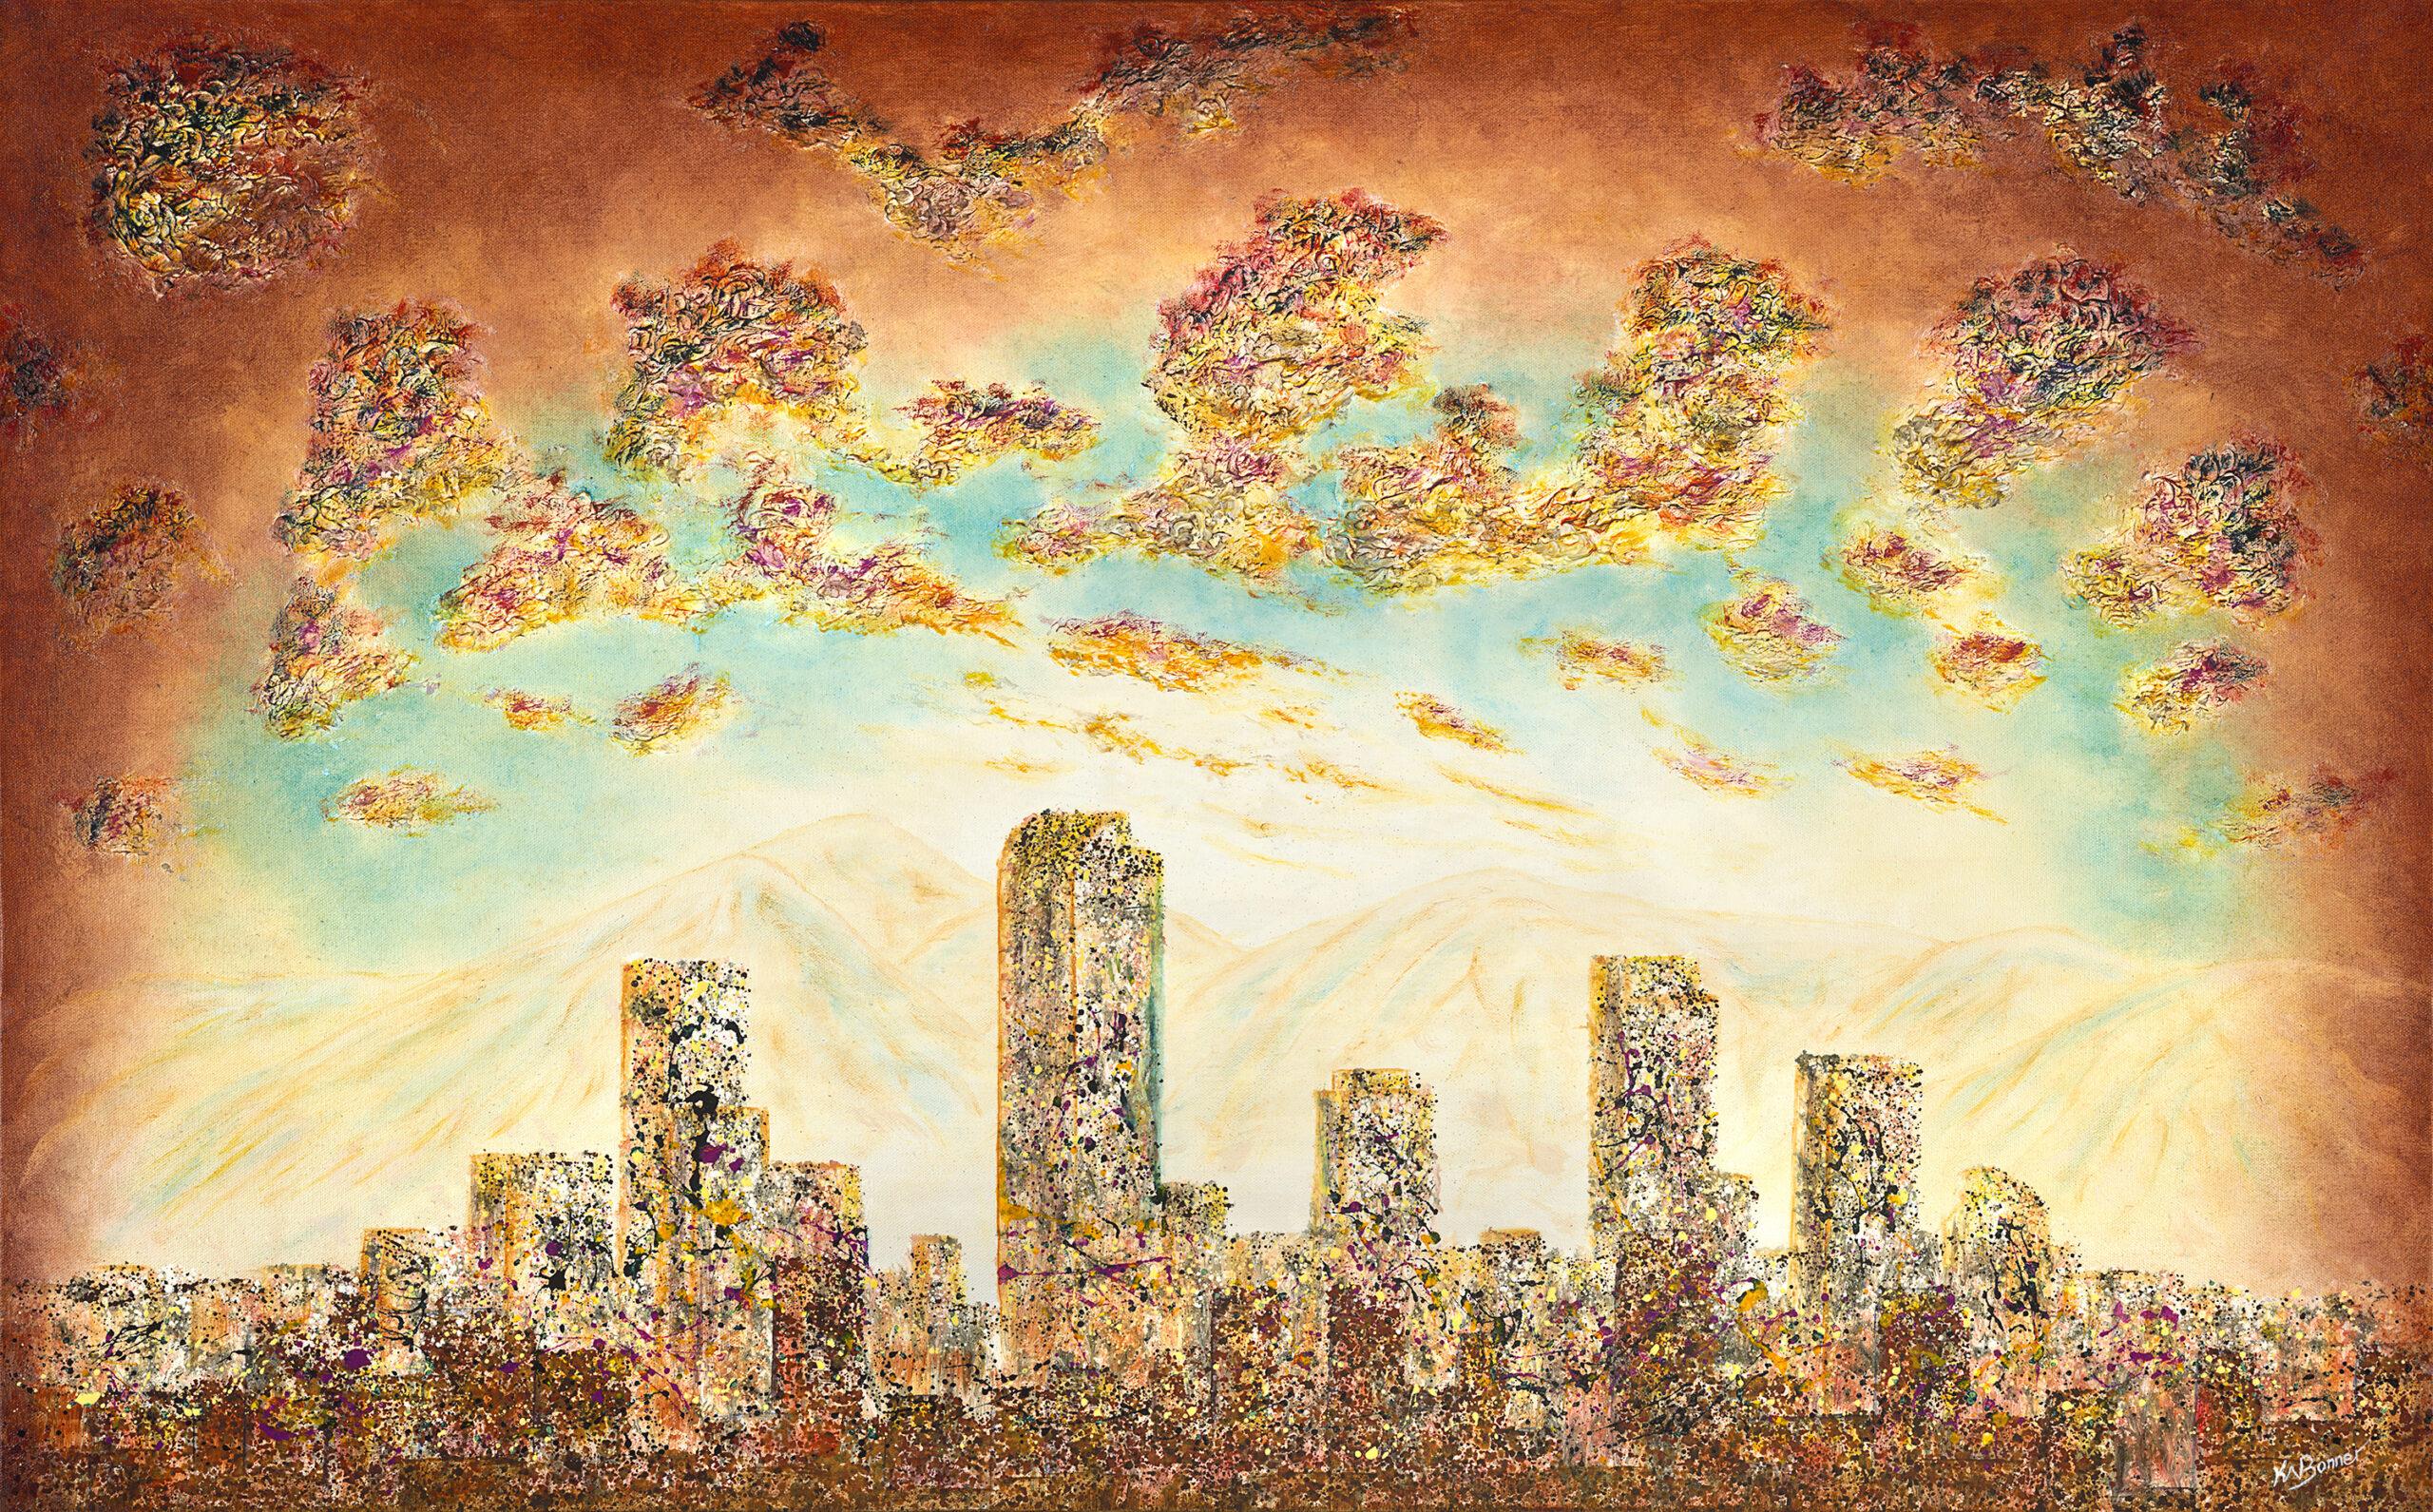 Rain'in Fire in the Sky | Denver Cityscape | Ken Bonner Original Oil Paintings | Santa Fe New Mexico